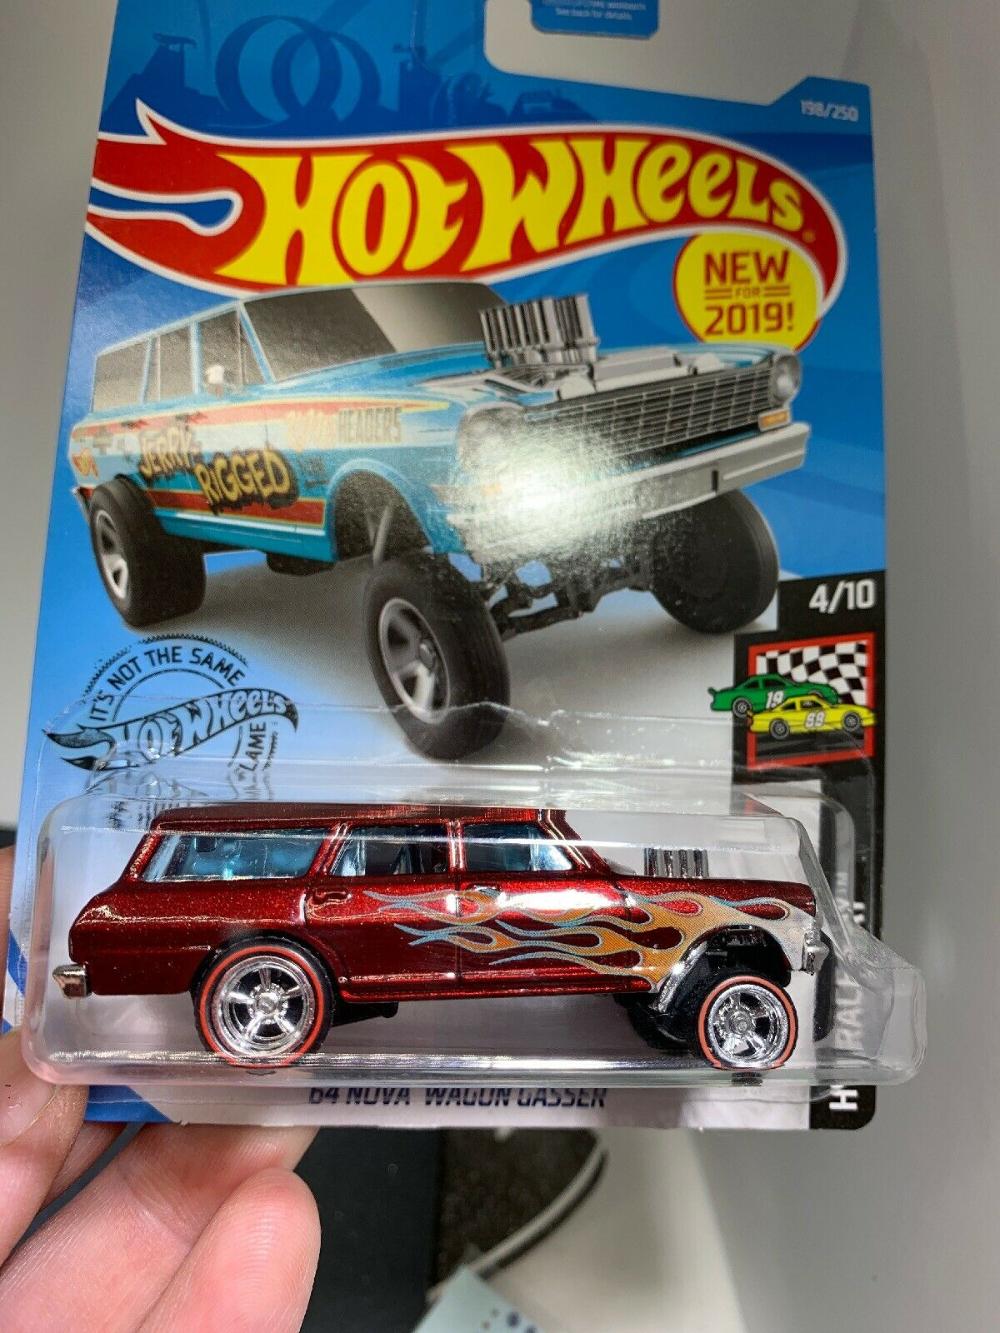 HOT WHEELS 2019 HW RACE DAY '64 NOVA WAGON GASSER Custom